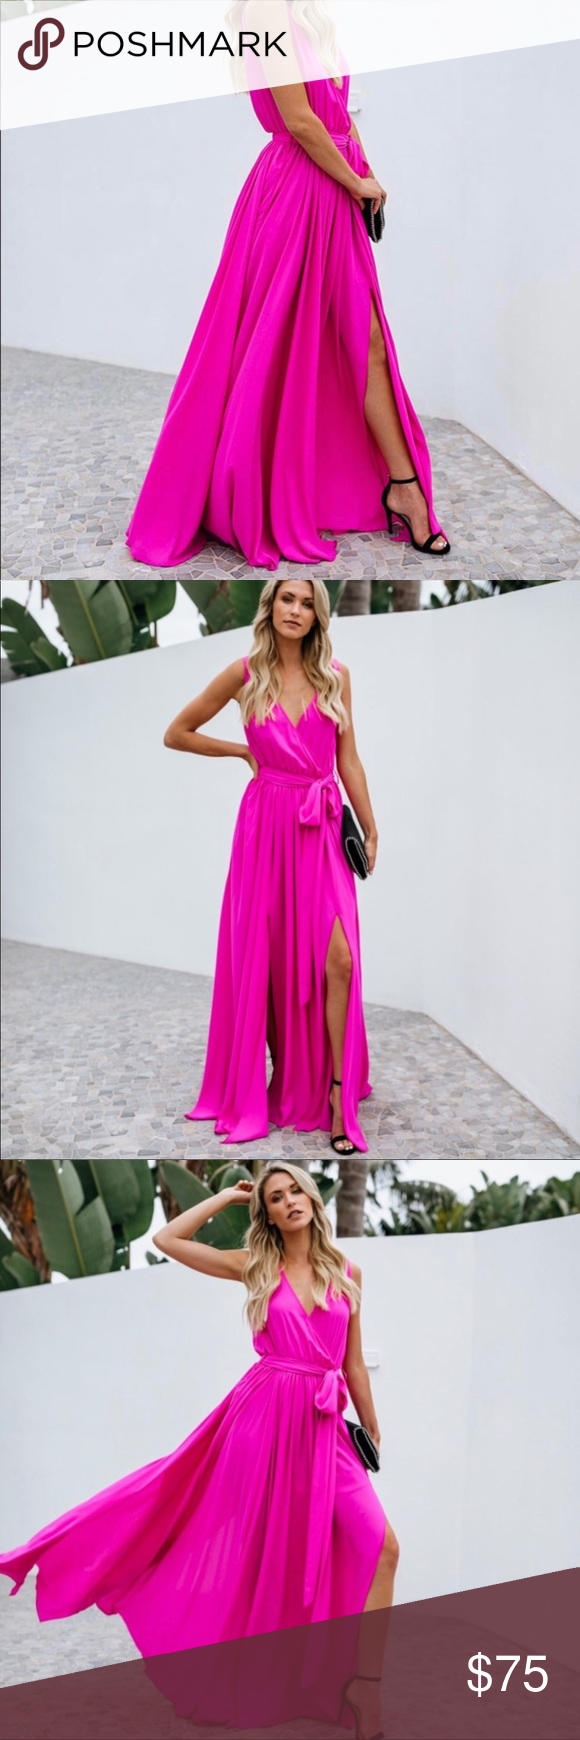 Vici Nwot Diana Sleeveless Maxi M In 2020 Maxi Dress Vici Dress Dresses [ 1740 x 580 Pixel ]